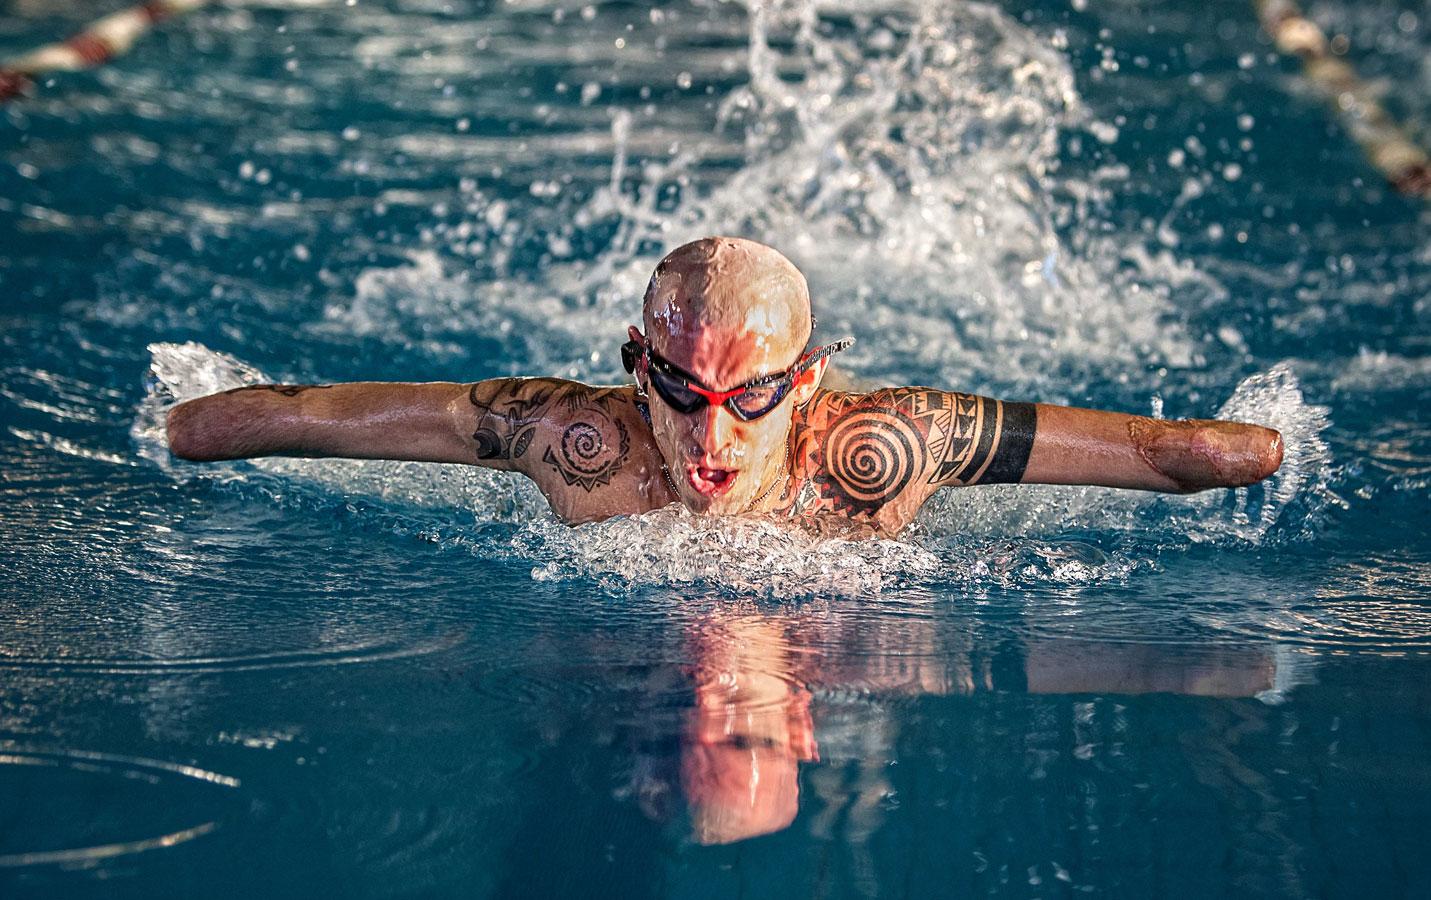 Бабочка в воде, © Джулио Монтини / Giulio Montini, Италия, 1 место в категории «Вызов», Фотоконкурс HIPA